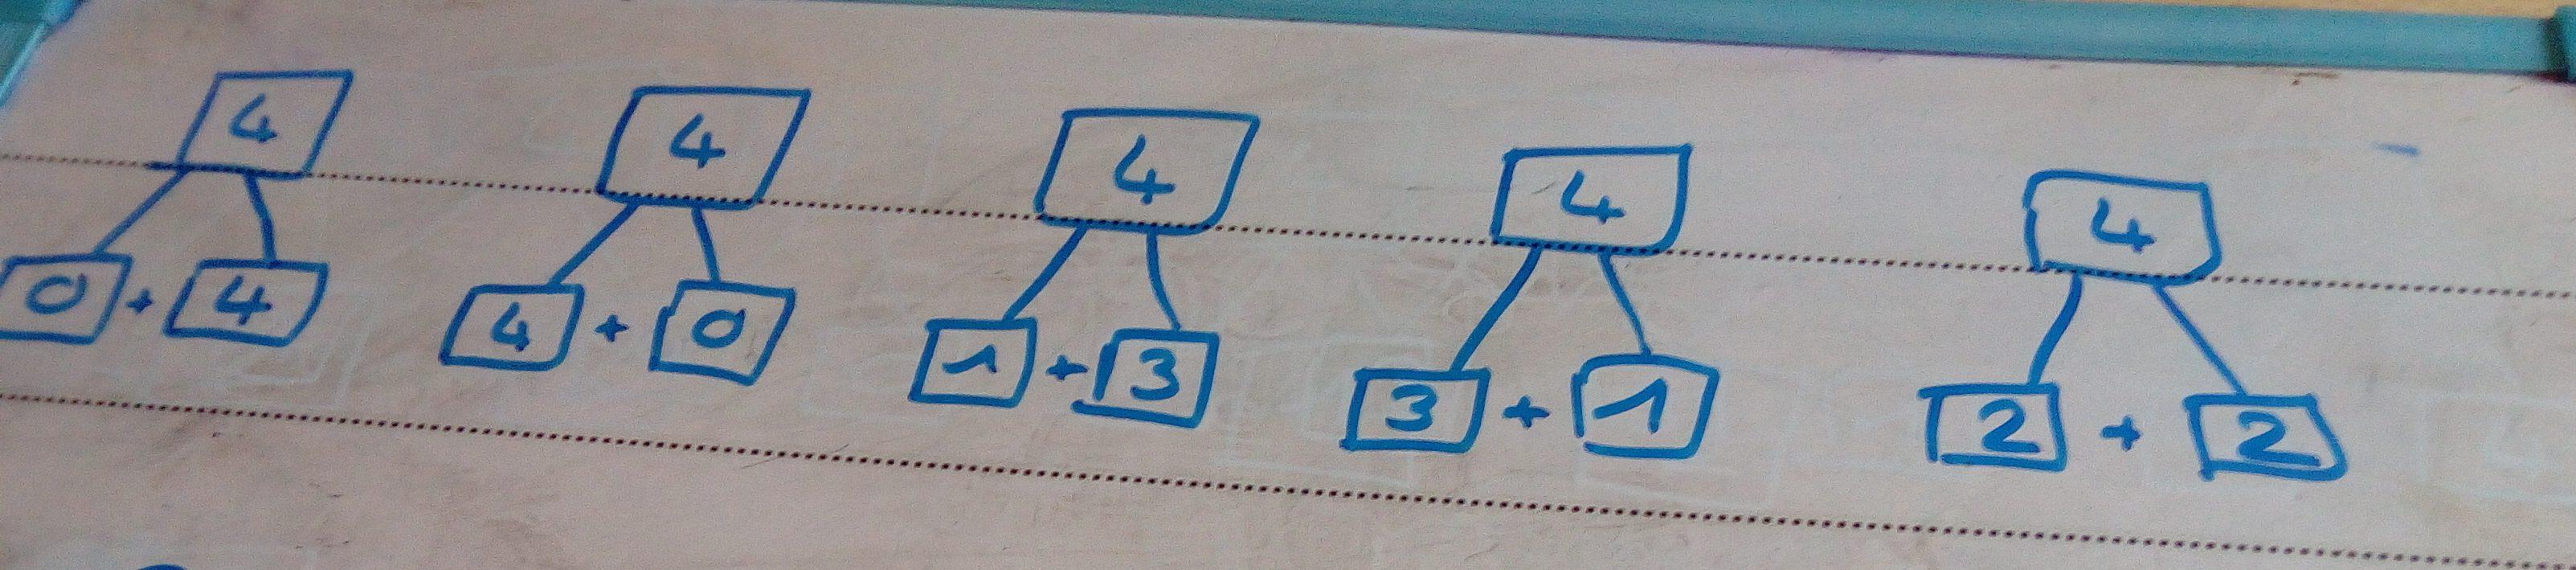 astuces apprendre tables d'addition